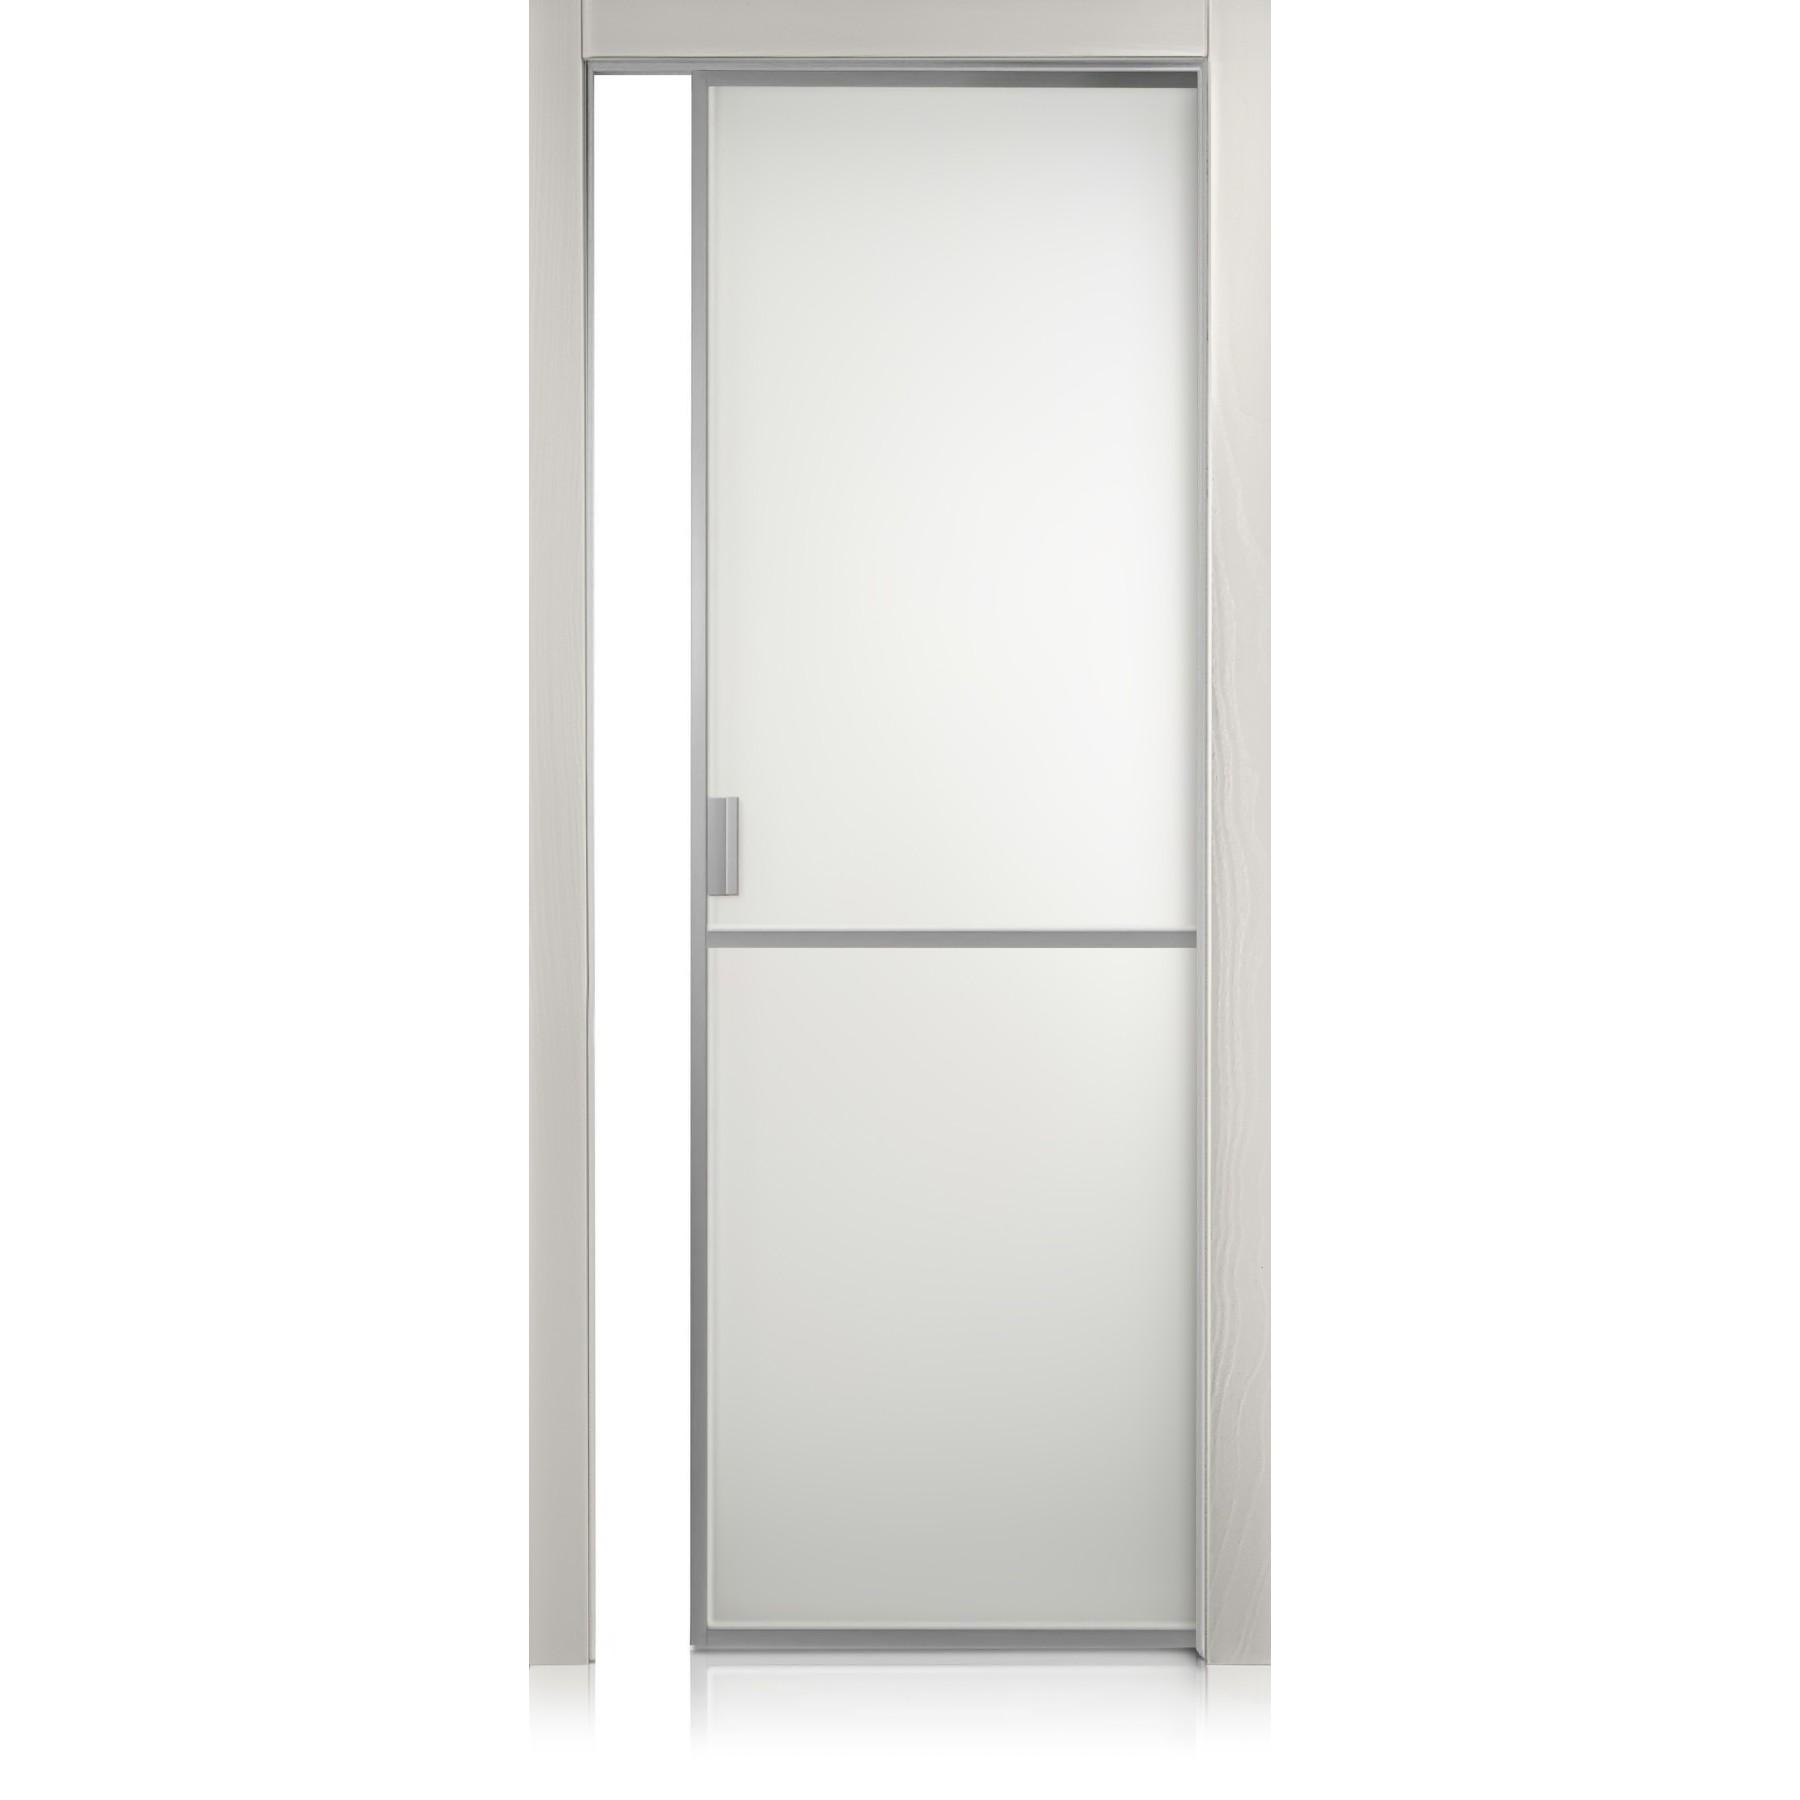 Tür Cristal Frame / 1 trame grigio lux